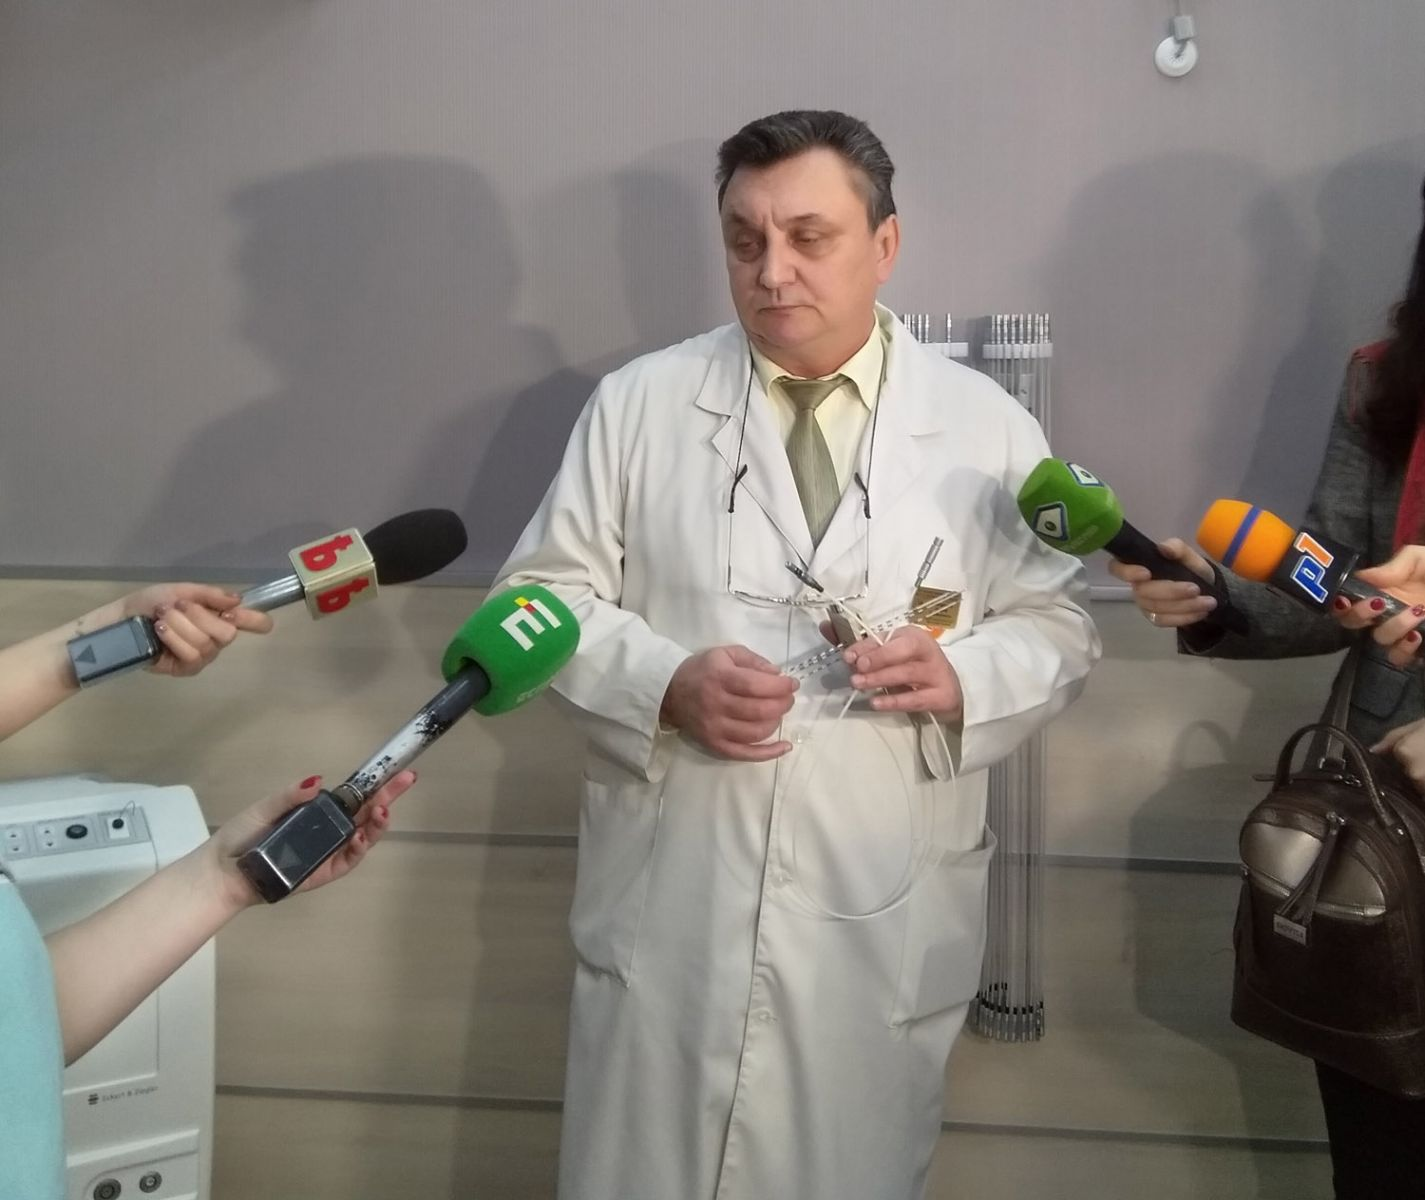 http://izvestia.kharkov.ua/content/documents/12873/1287271/images/rjgbx.jpg